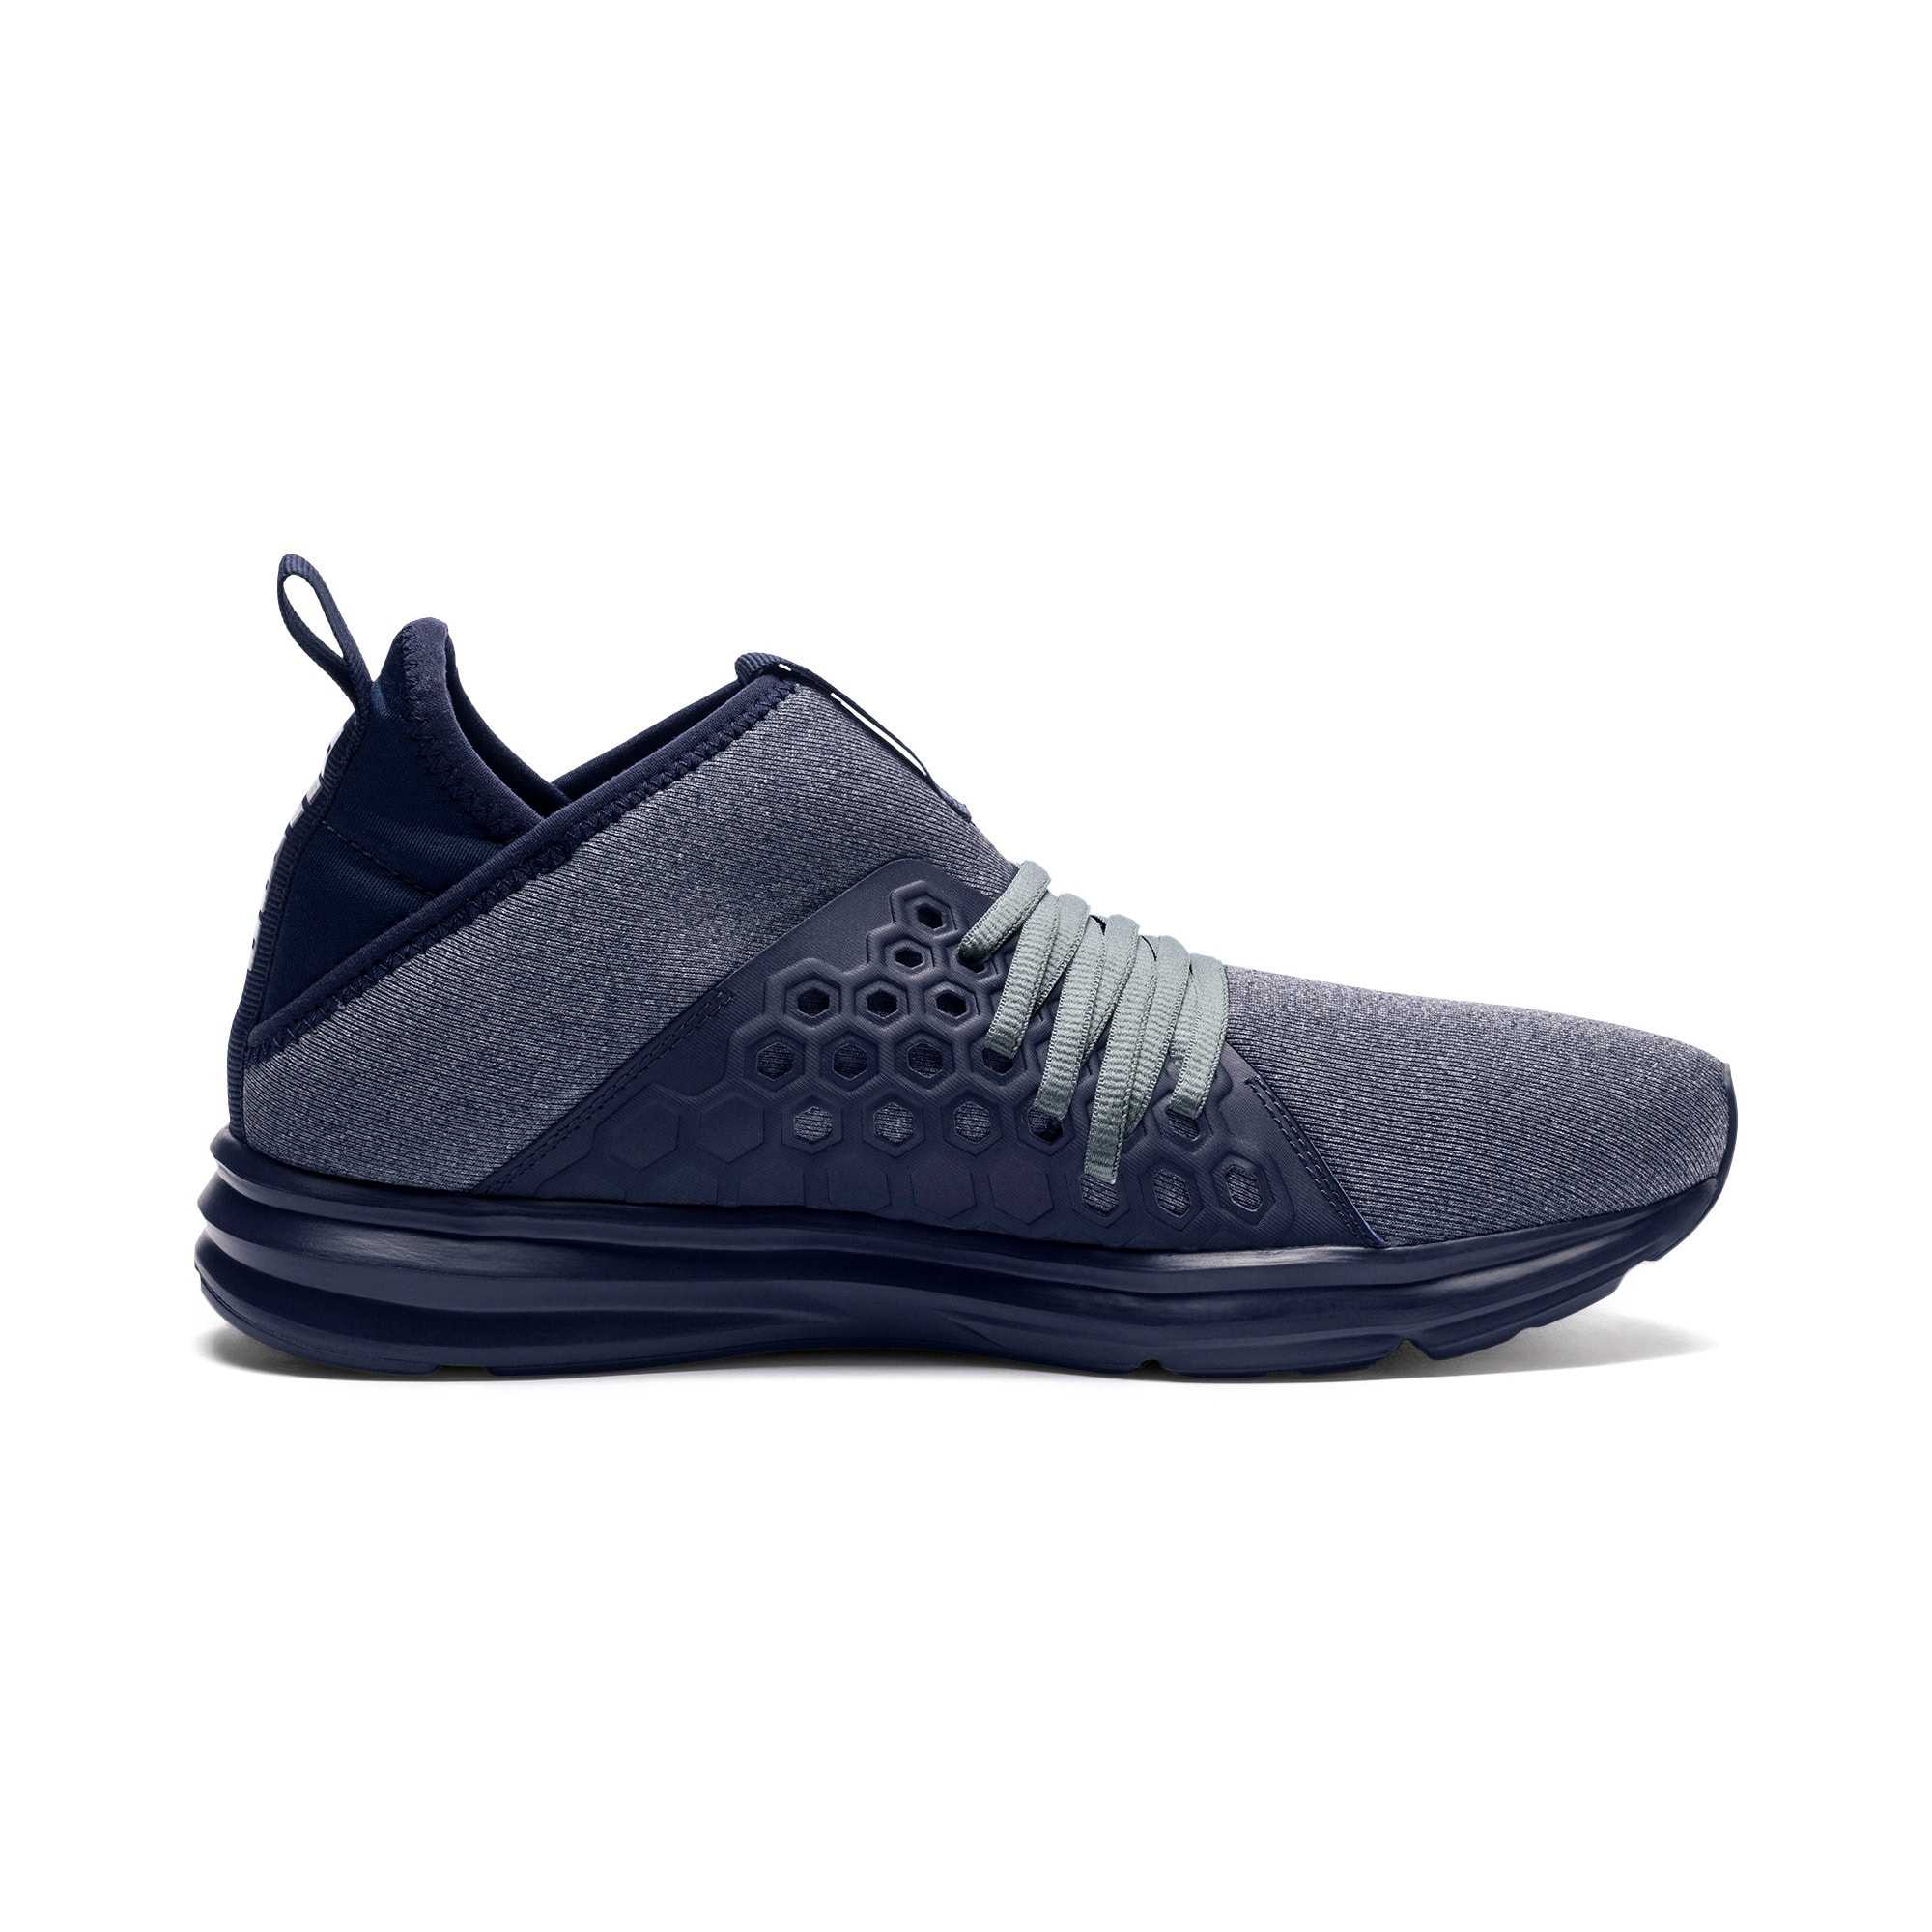 Thumbnail 5 of Enzo NF Mid Men's Training Shoes, Peacoat-Quarry, medium